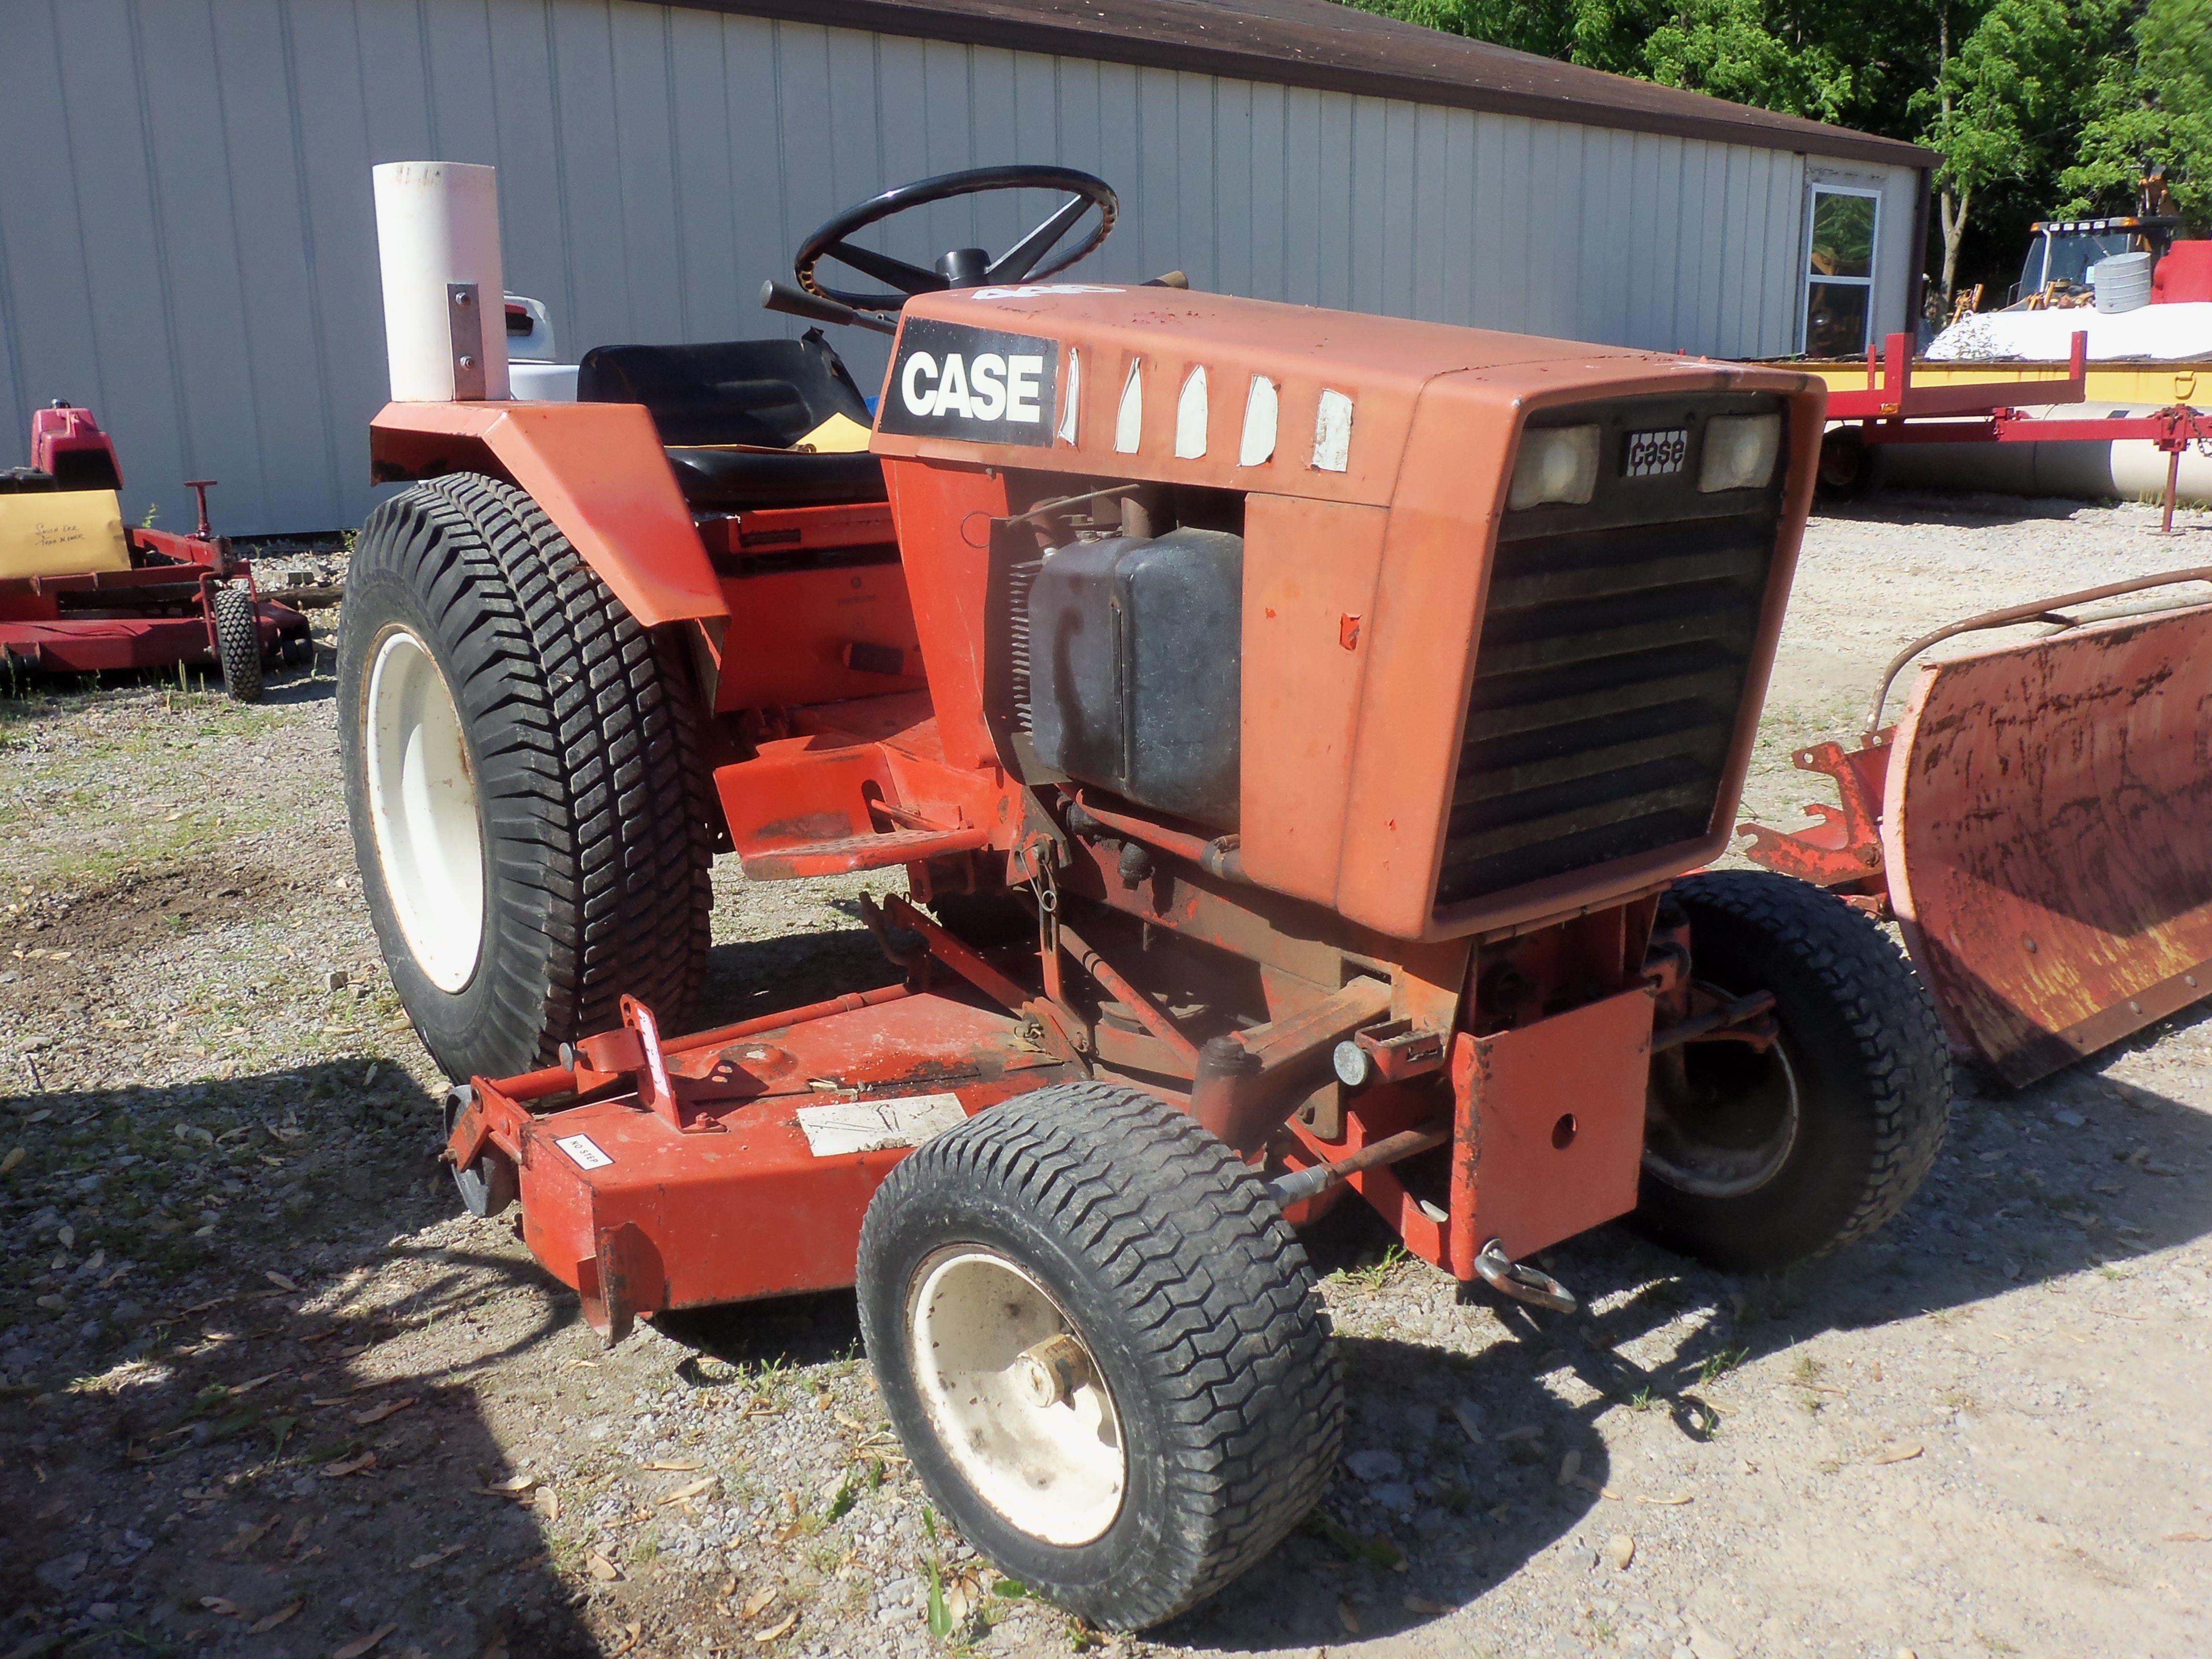 Case 446 Garden Tractor : Case garden tractor j i equipment pinterest